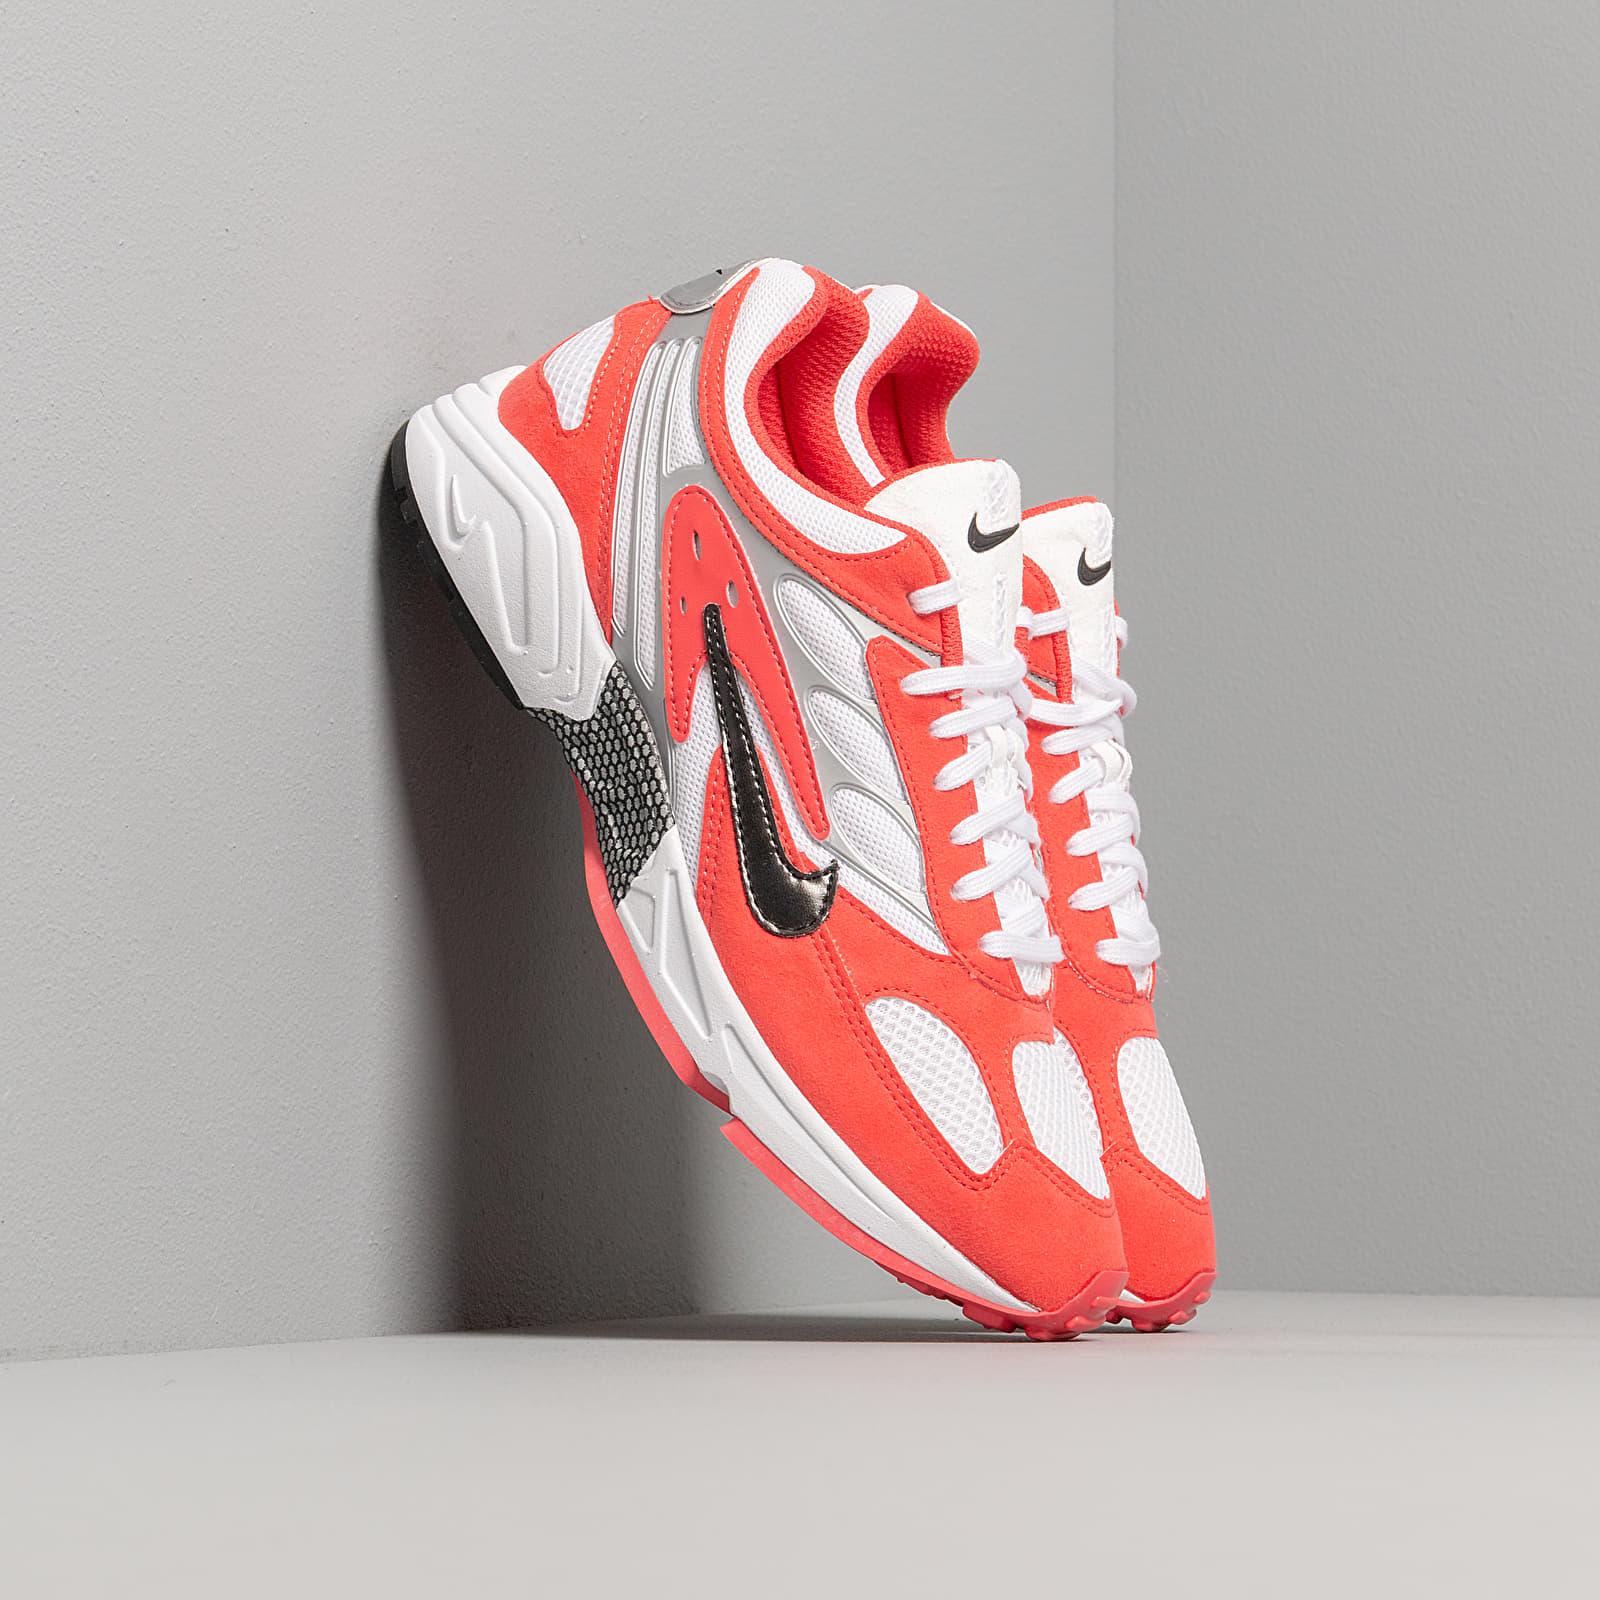 Pánske tenisky a topánky Nike Air Ghost Racer Track Red/ Black-White-Metallic Silver